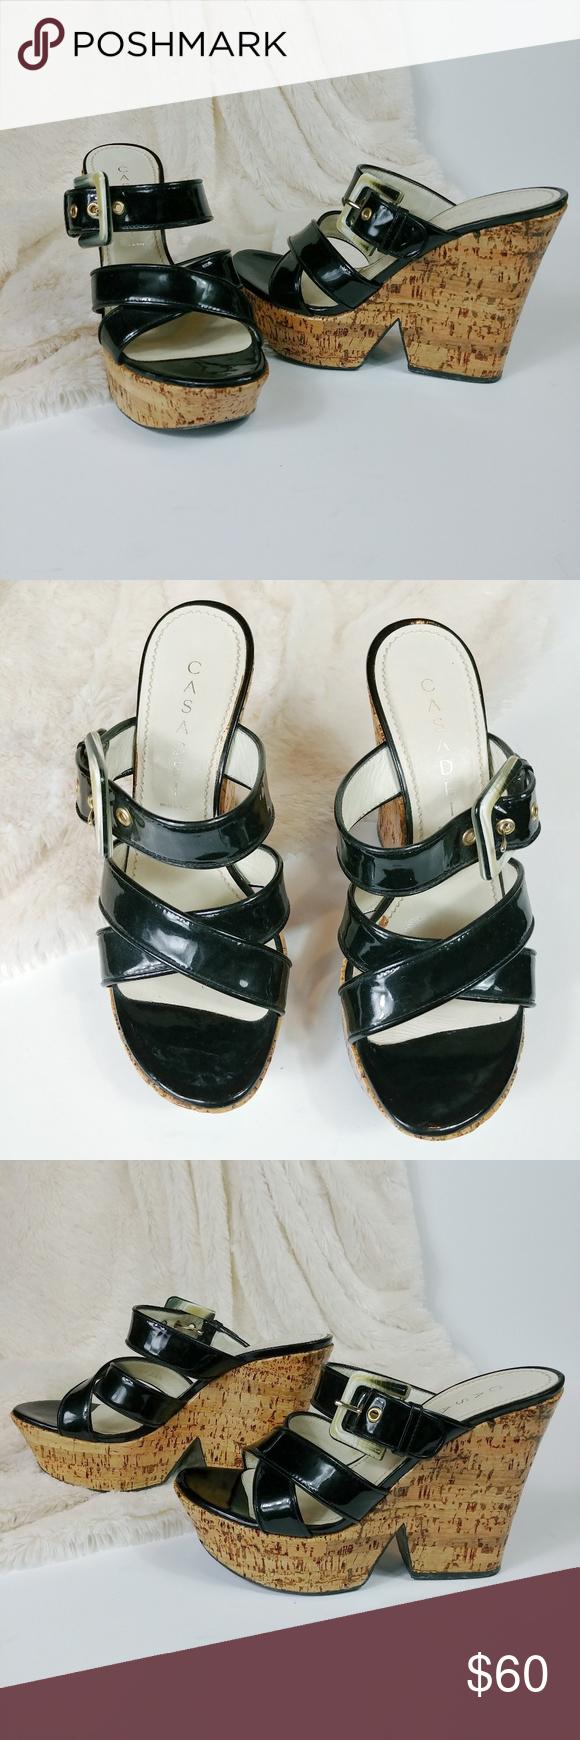 Casadei Black Patent Leather Platform Sandals In 2020 Leather Platform Sandals Black Patent Leather Patent Sandals